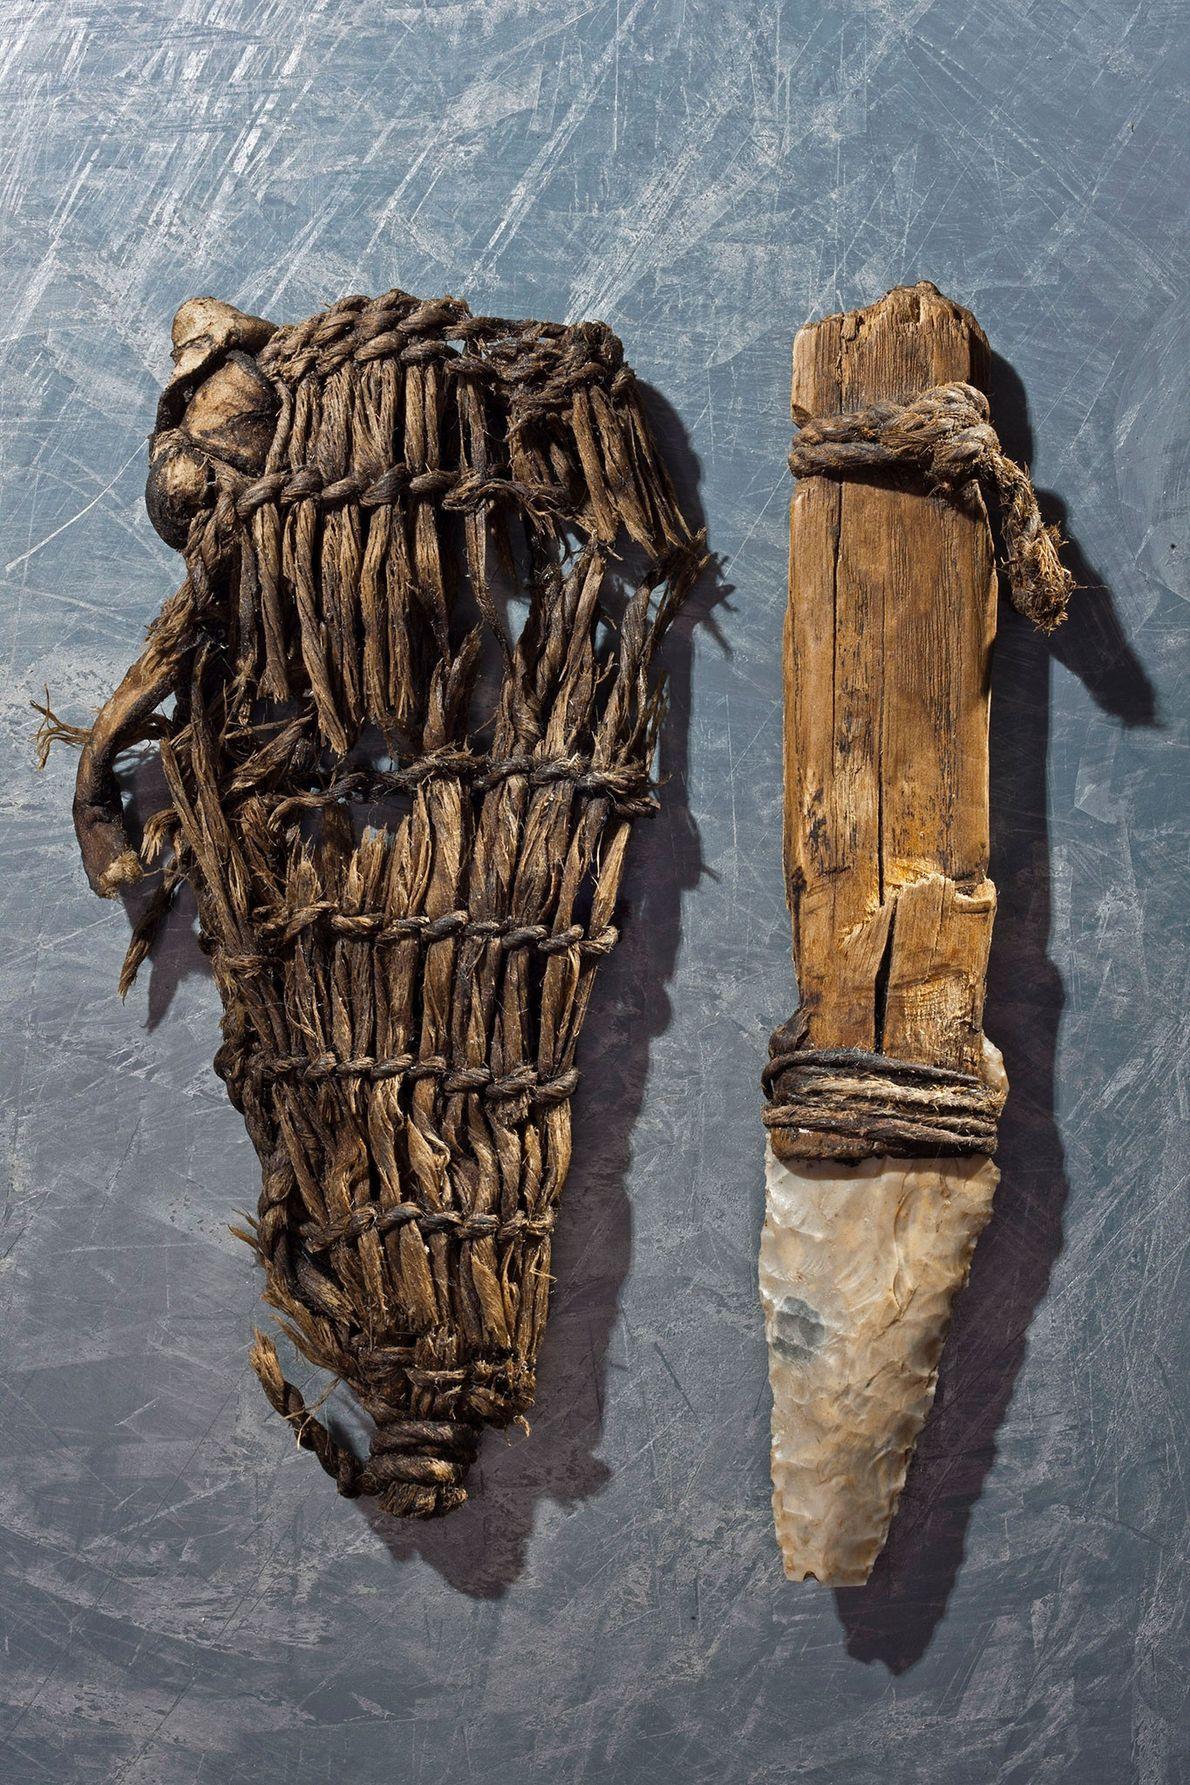 The Iceman's dagger featured a flint blade and a grass sheath.